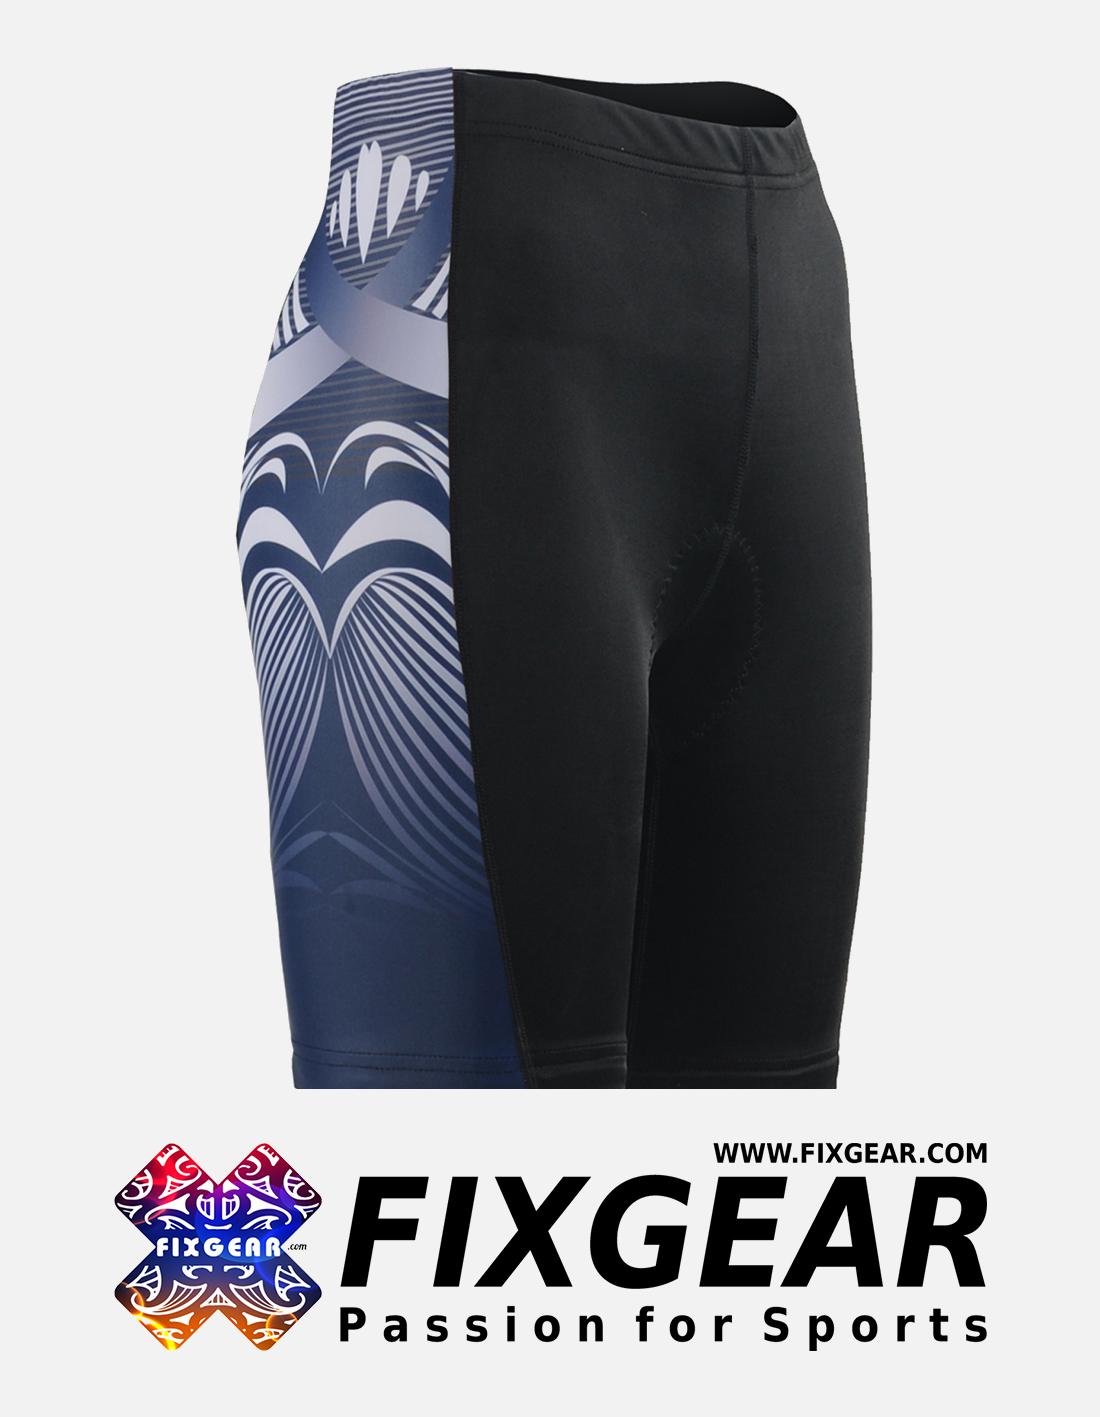 FIXGEAR ST-WJ2 Women's Cycling Padded Shorts